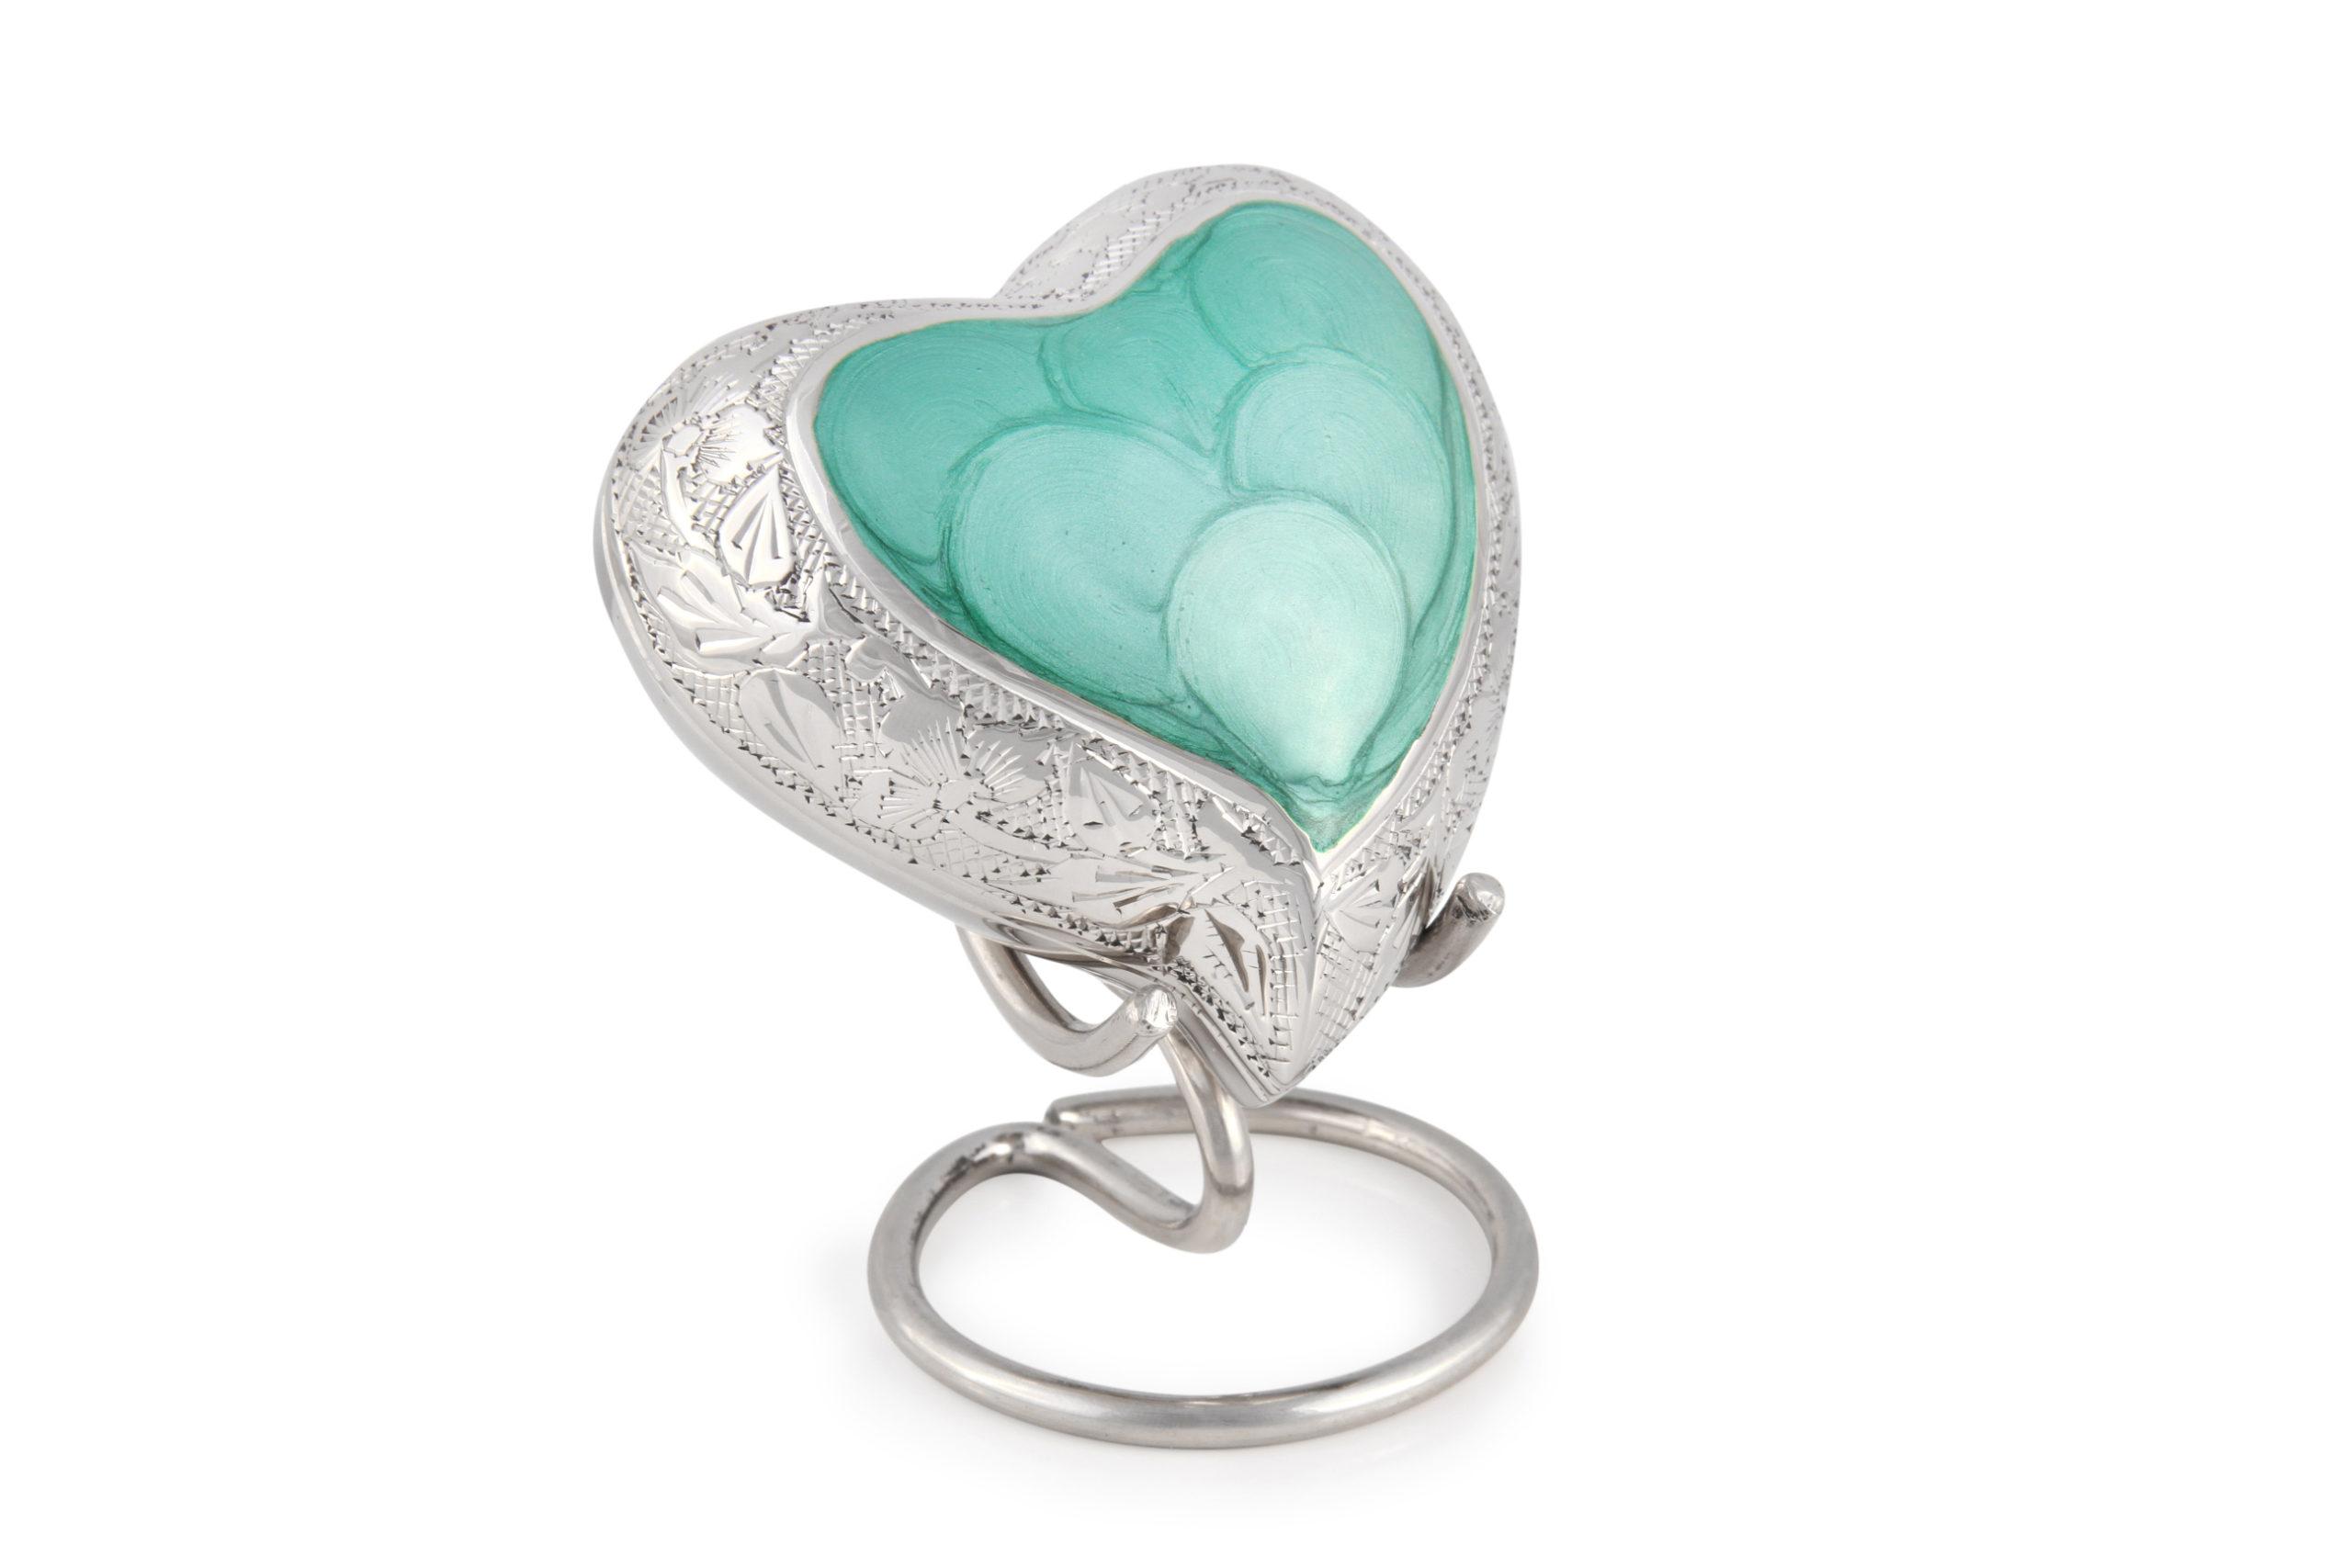 Baby Jade heart keepsake urn